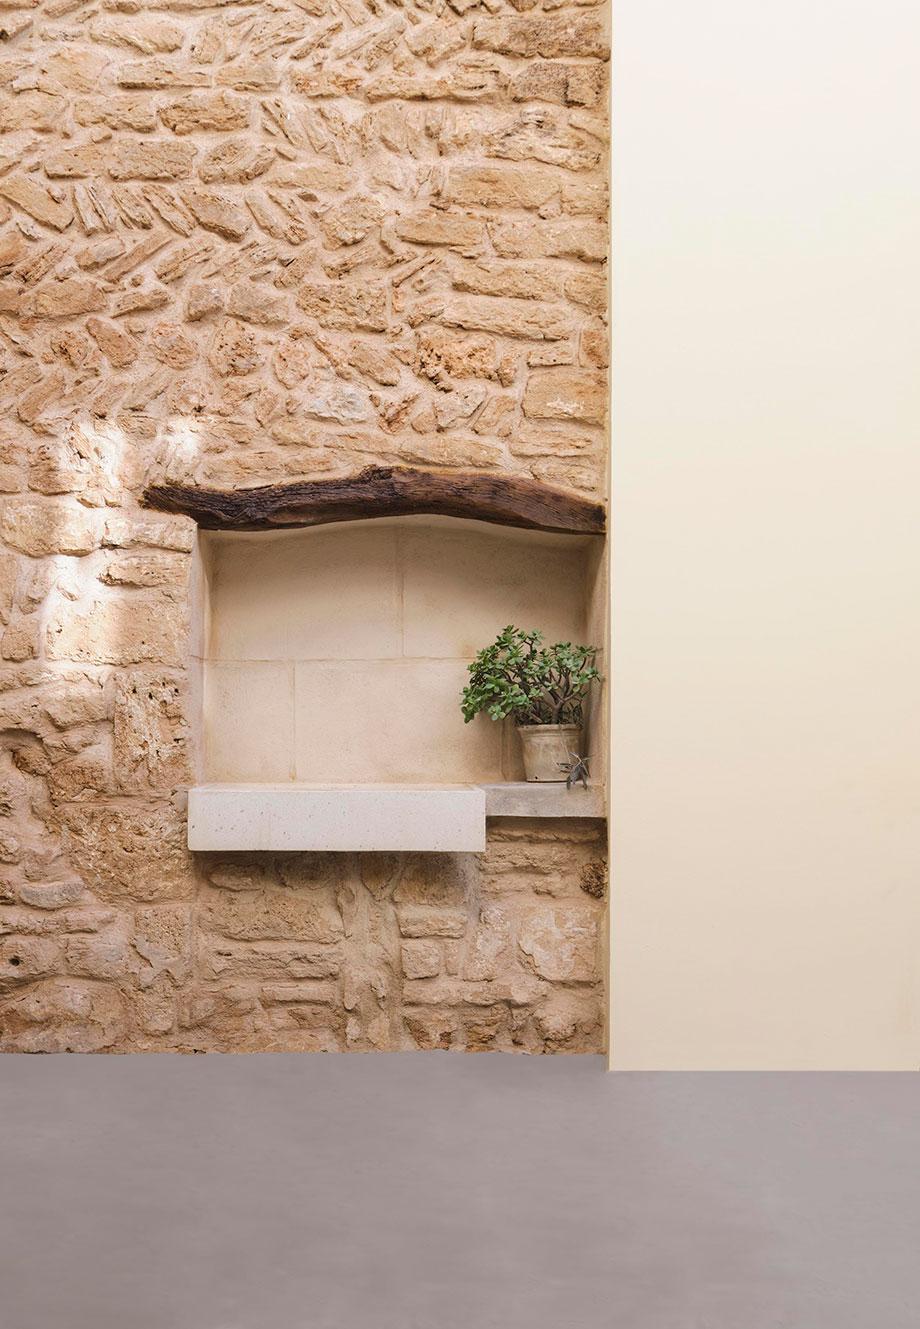 casa lledoner xxxii de minimal studio (17) - foto art sanchez